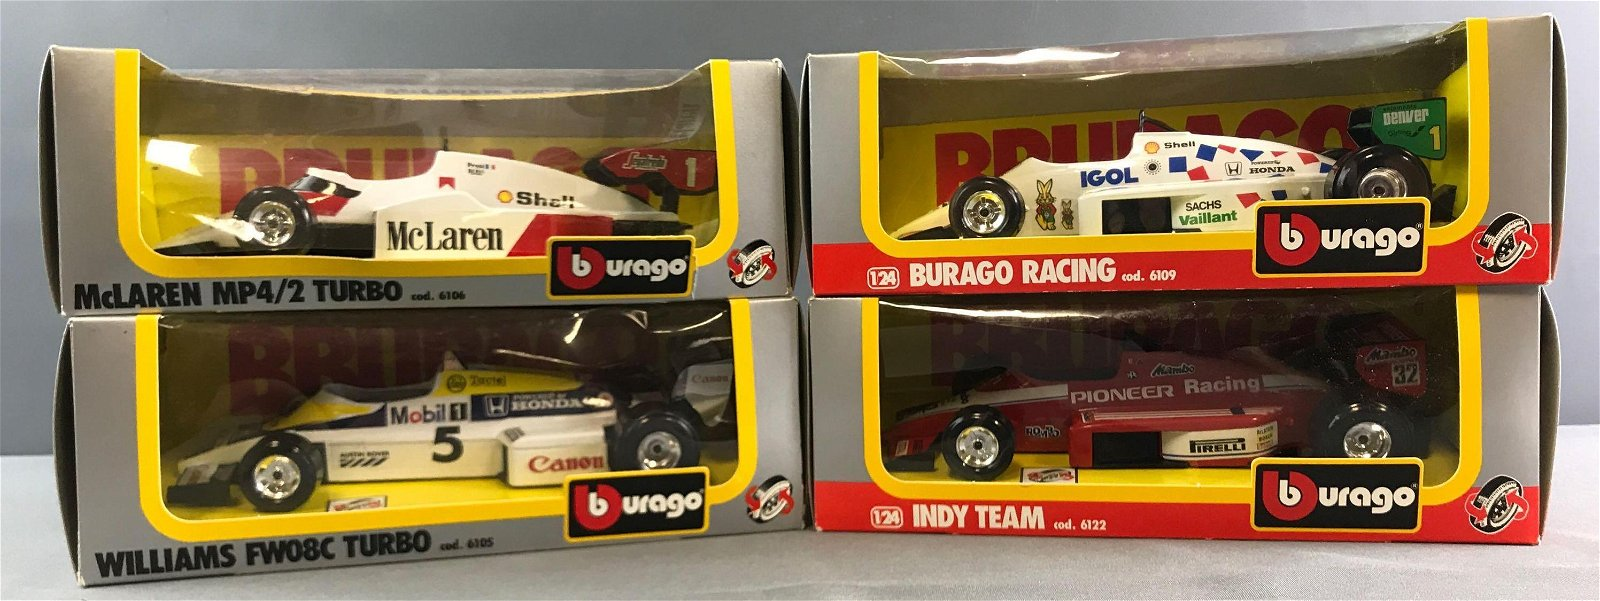 Group of 4 Burago Die Cast and Plastic Racing Cars In